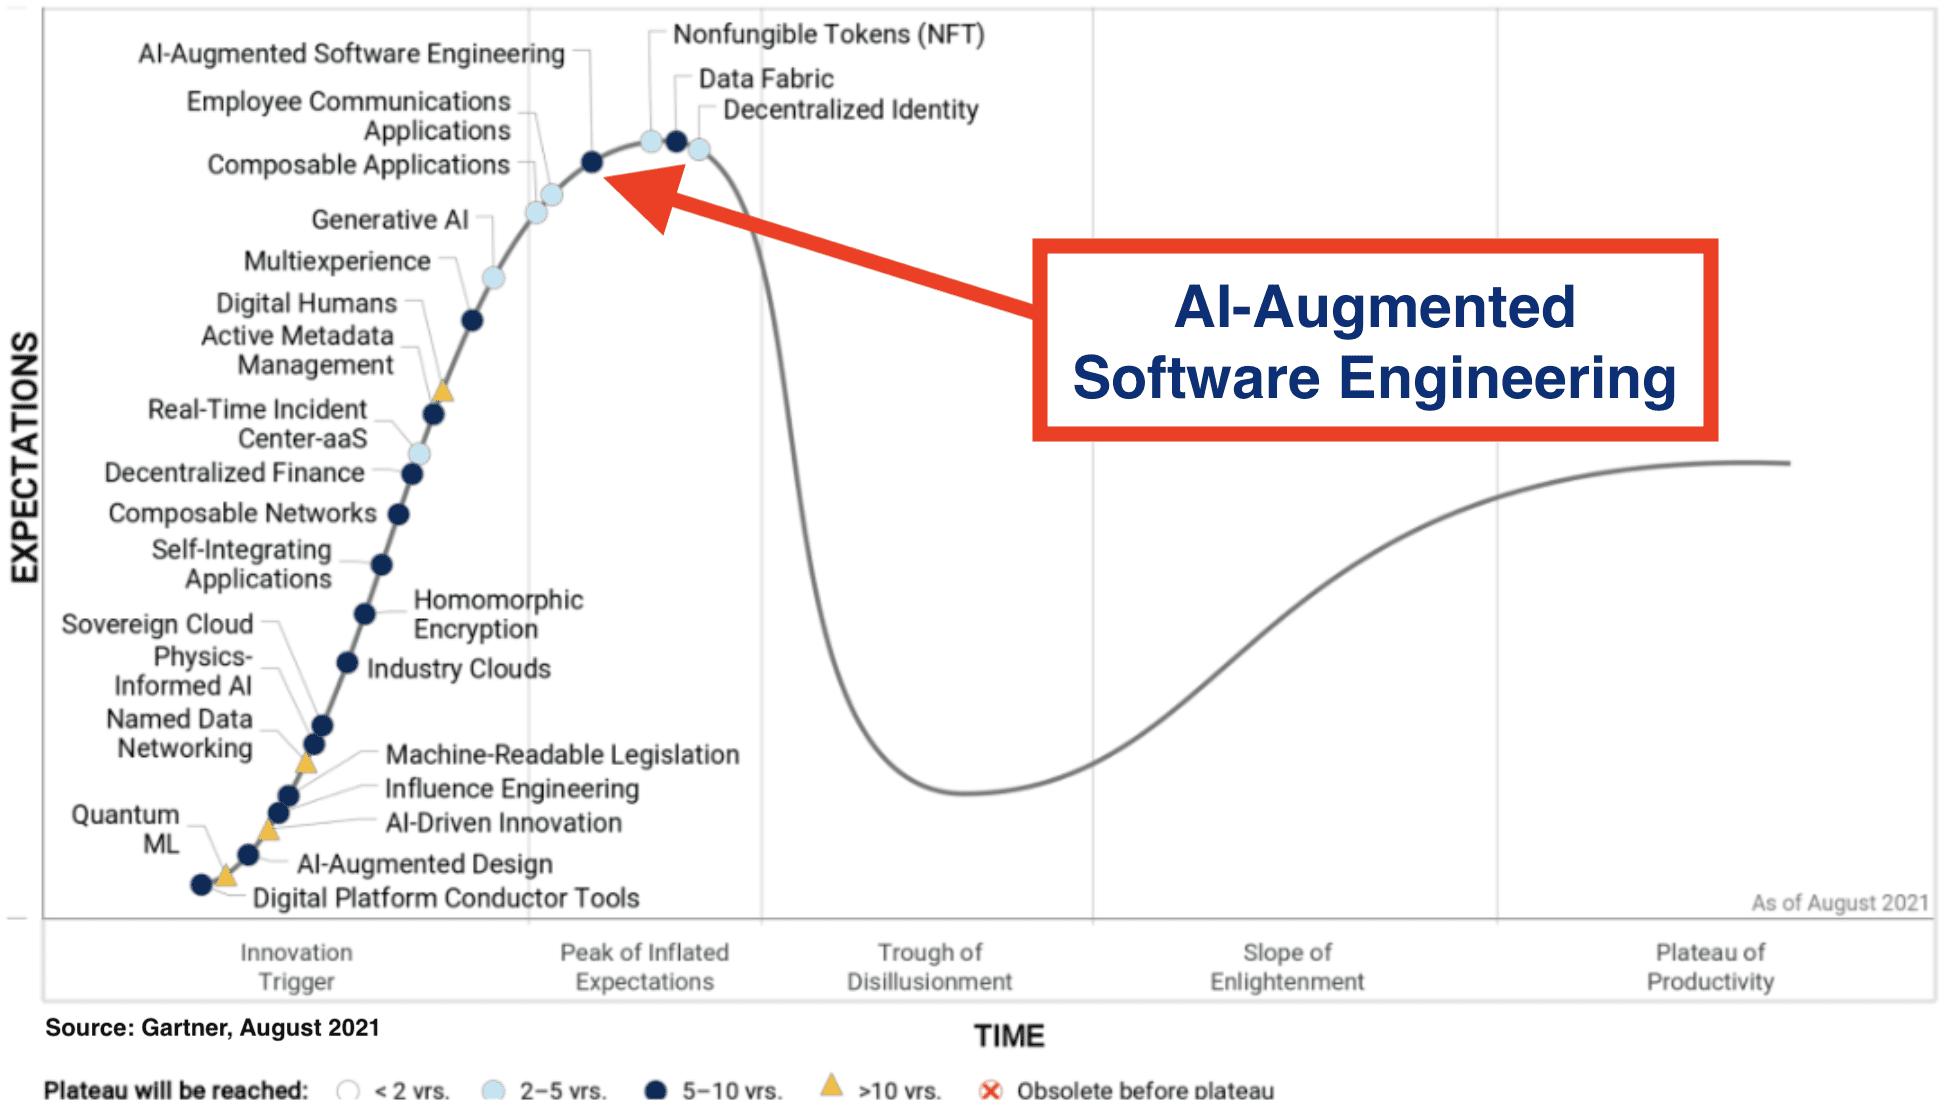 AI-Augmented Software Development